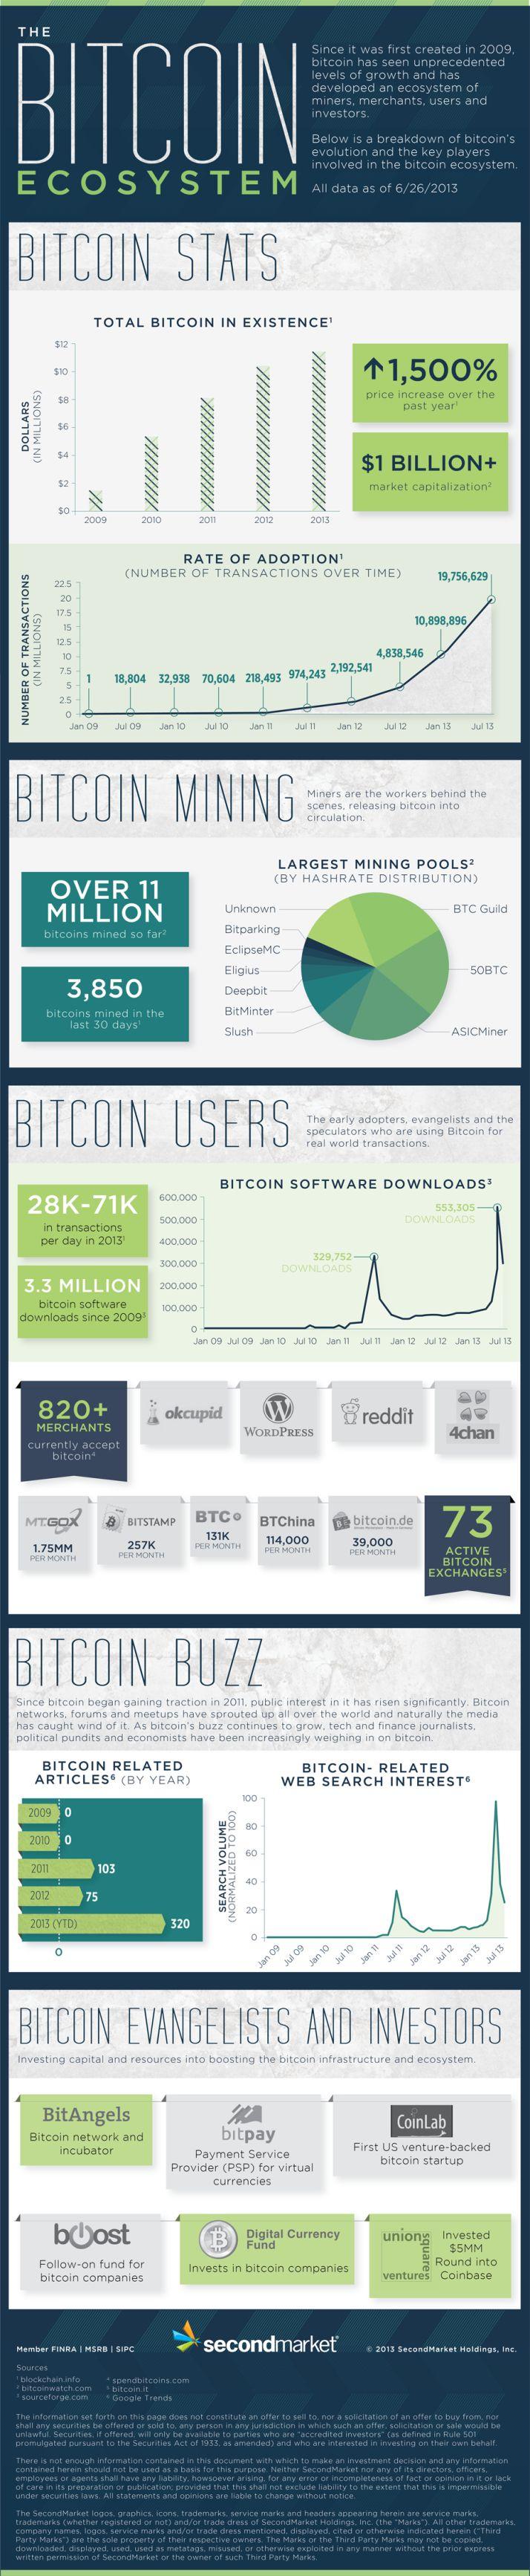 The BitCoin ecosystem #infografia #infographic #internet